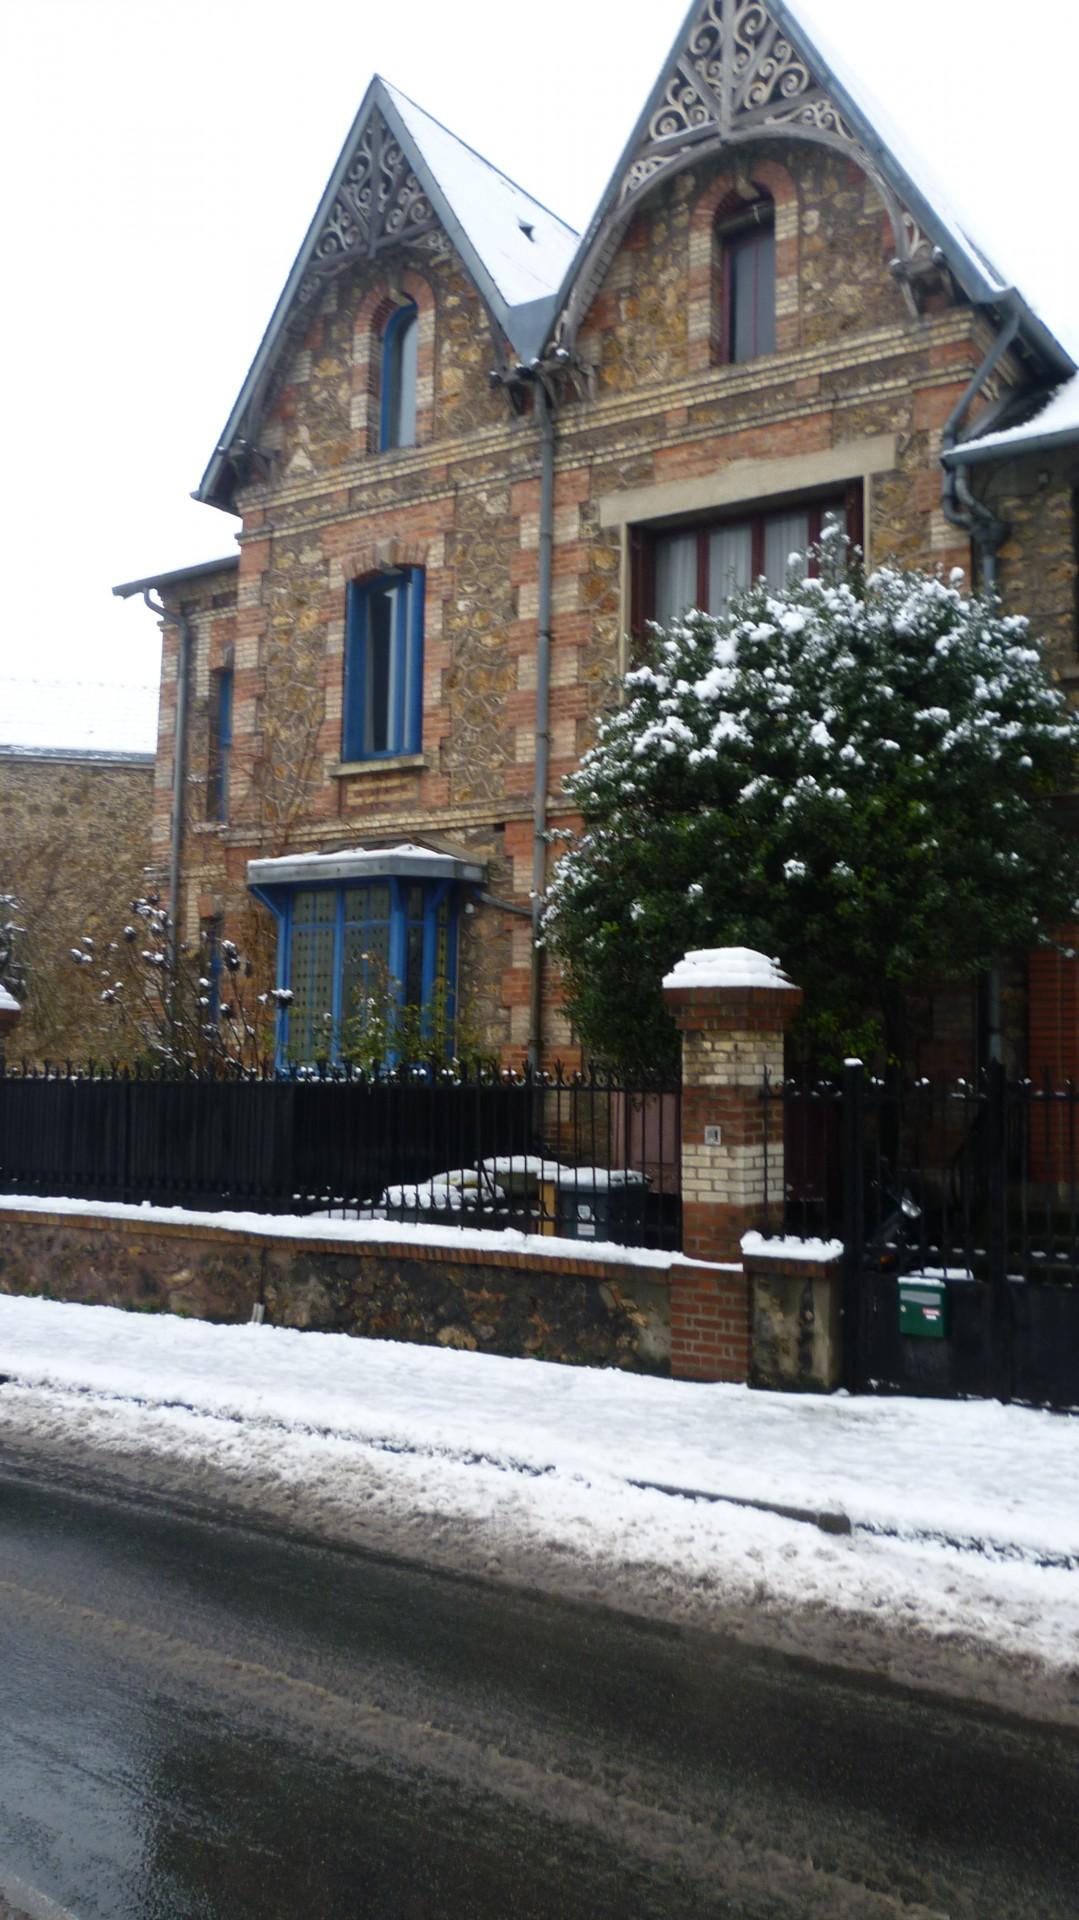 Neige à Antony